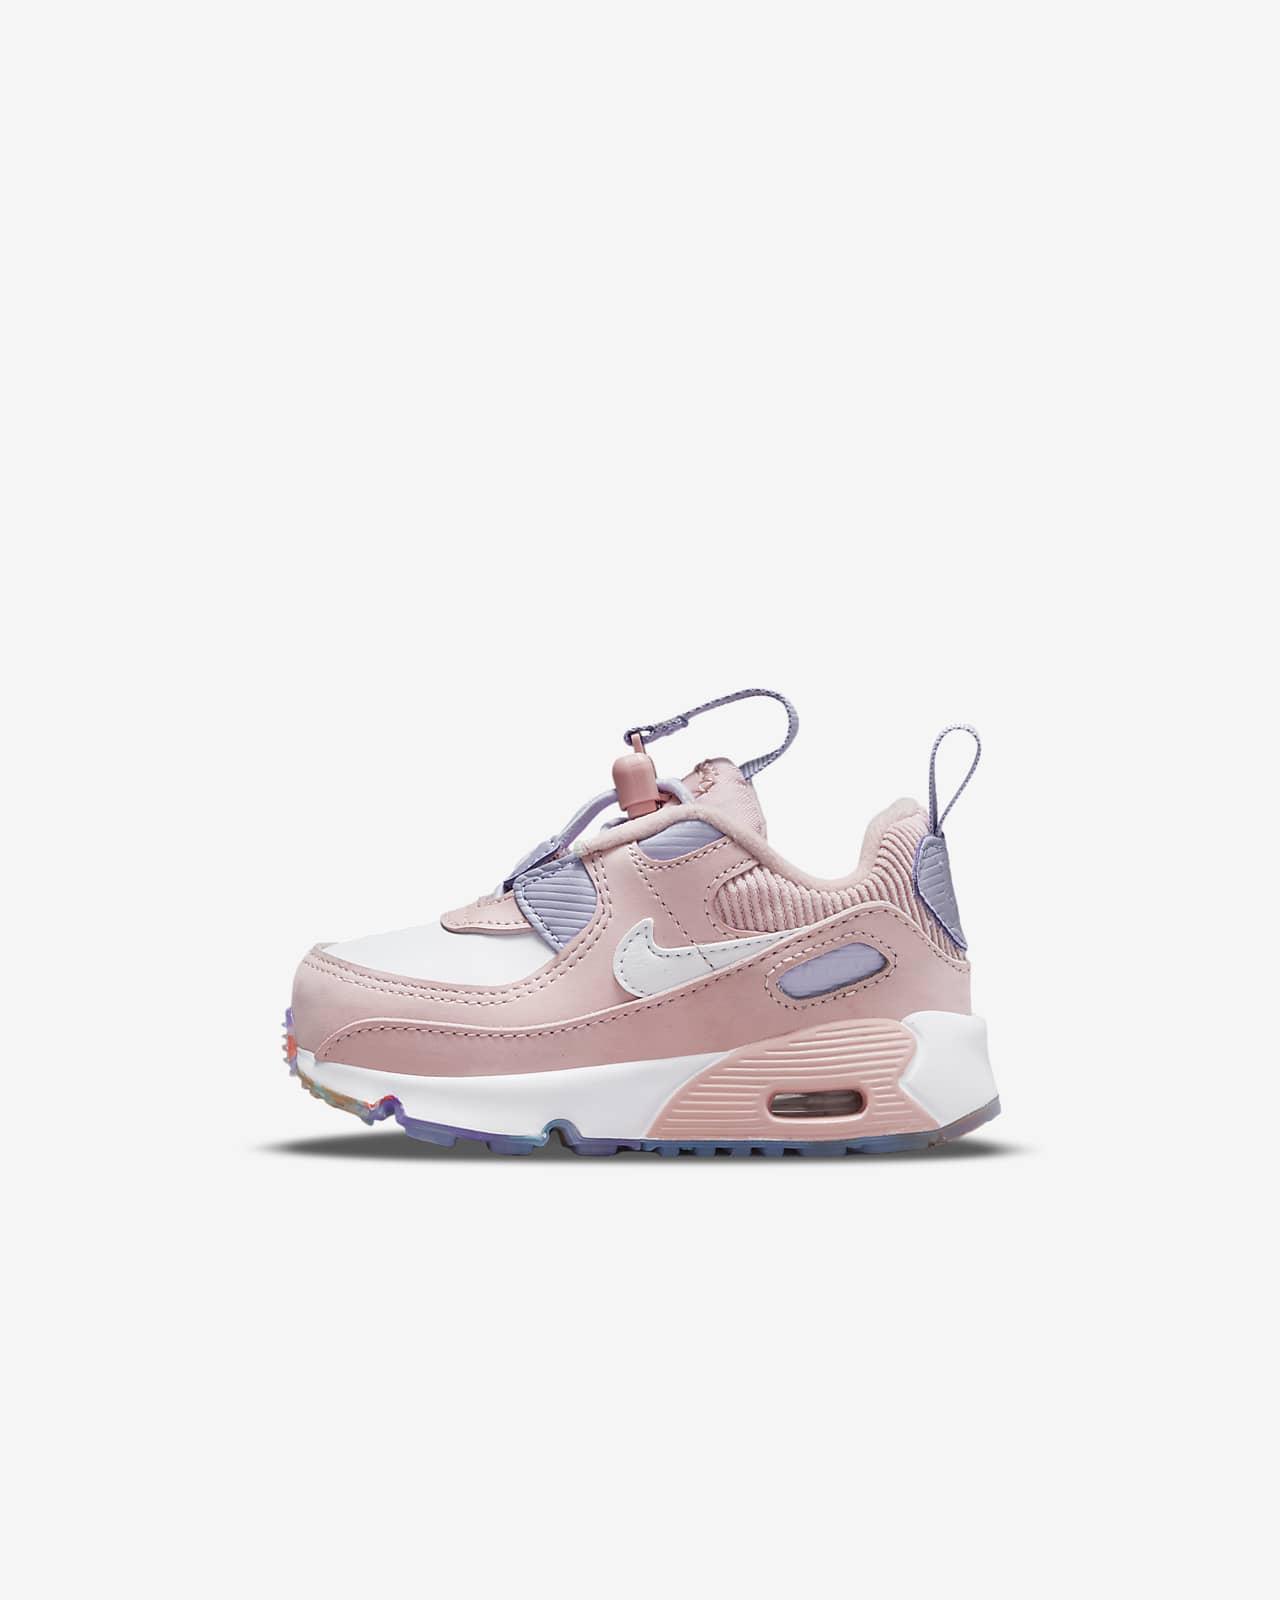 Nike Air Max 90 Toggle SE 嬰幼兒鞋款